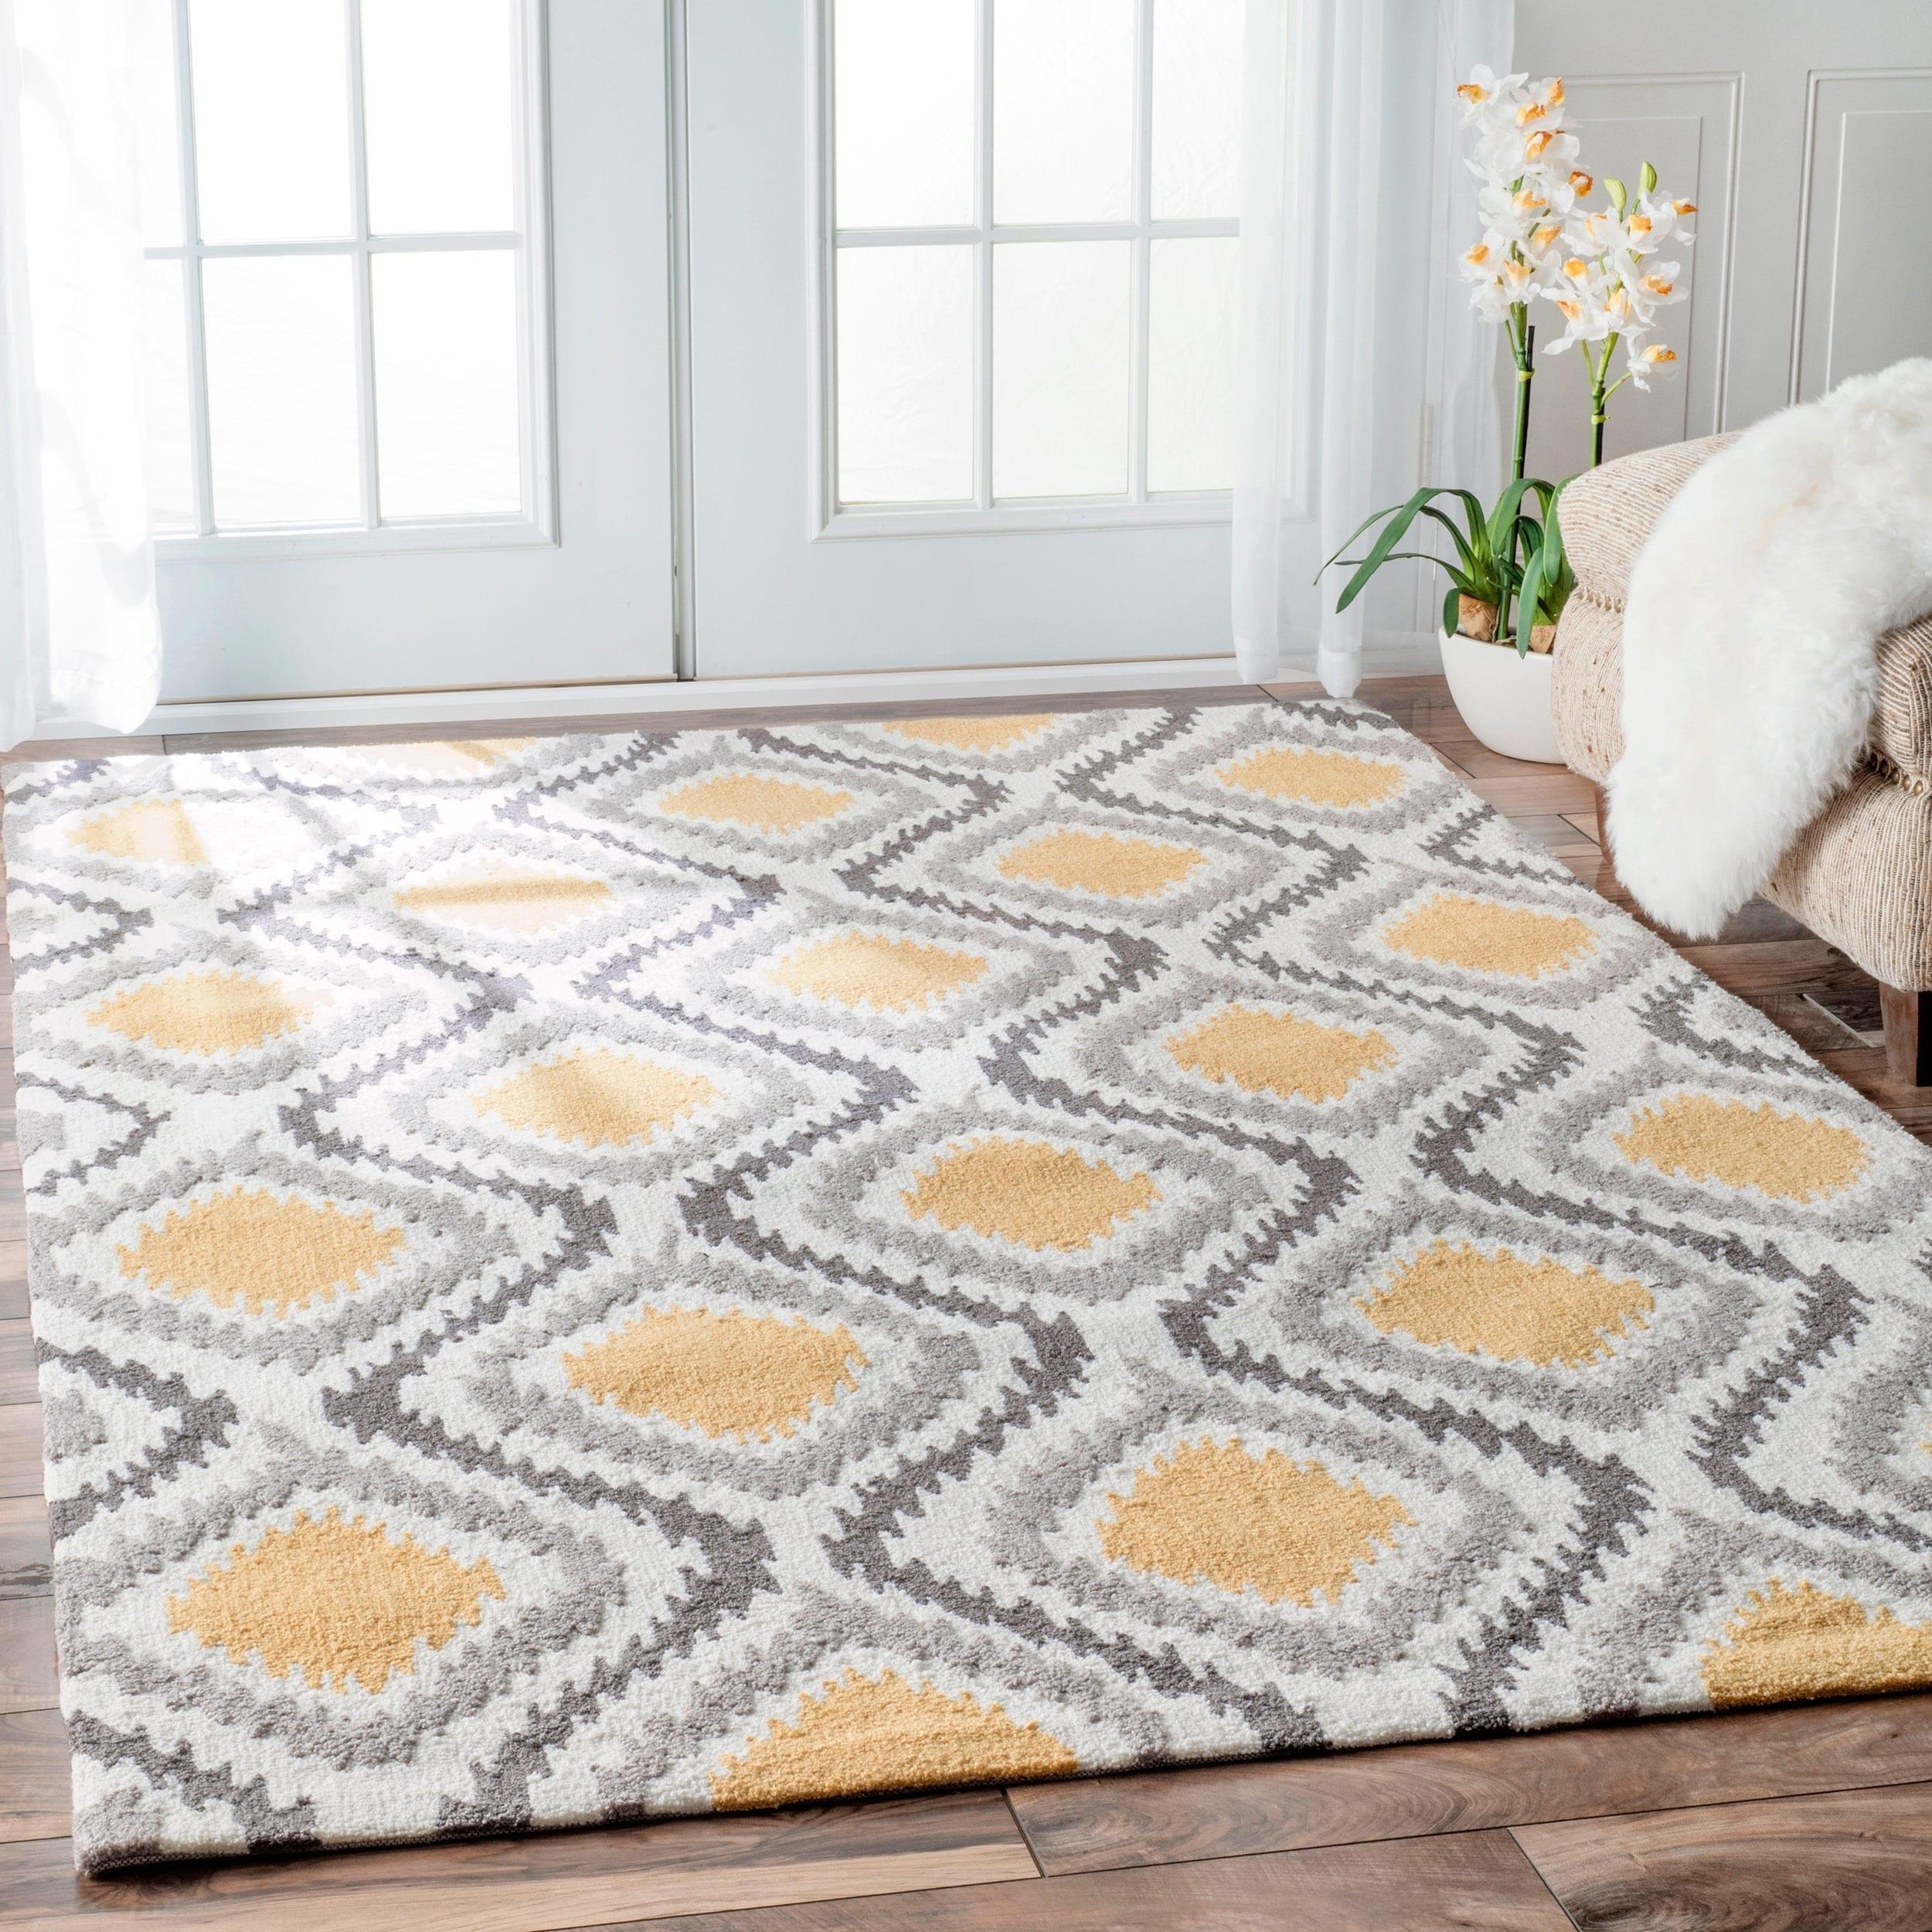 Palm Canyon Algiers Hand Hooked Modern Ikat Wool Area Rug